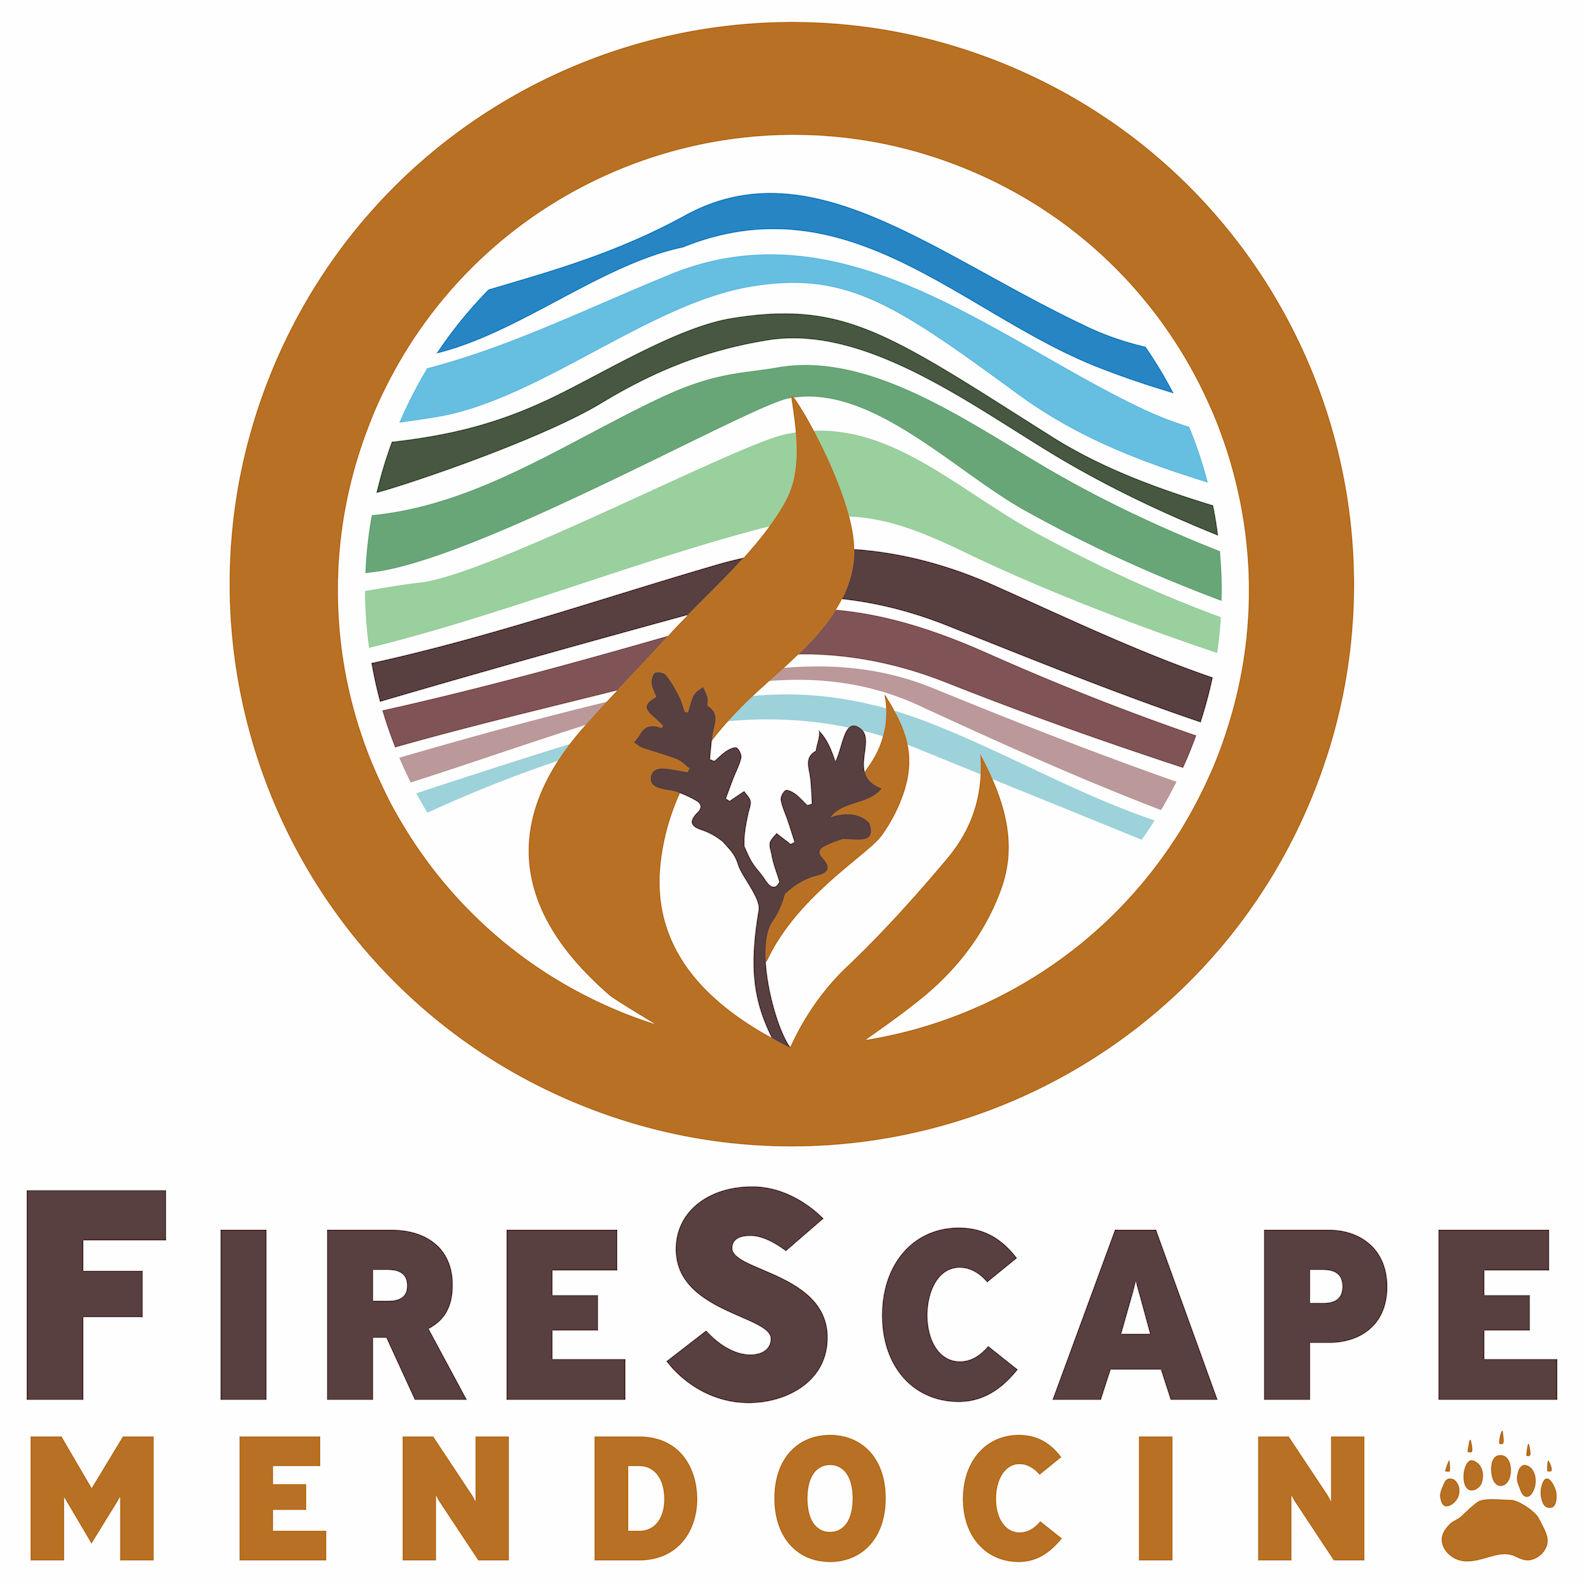 FireScape Mendocino Logo